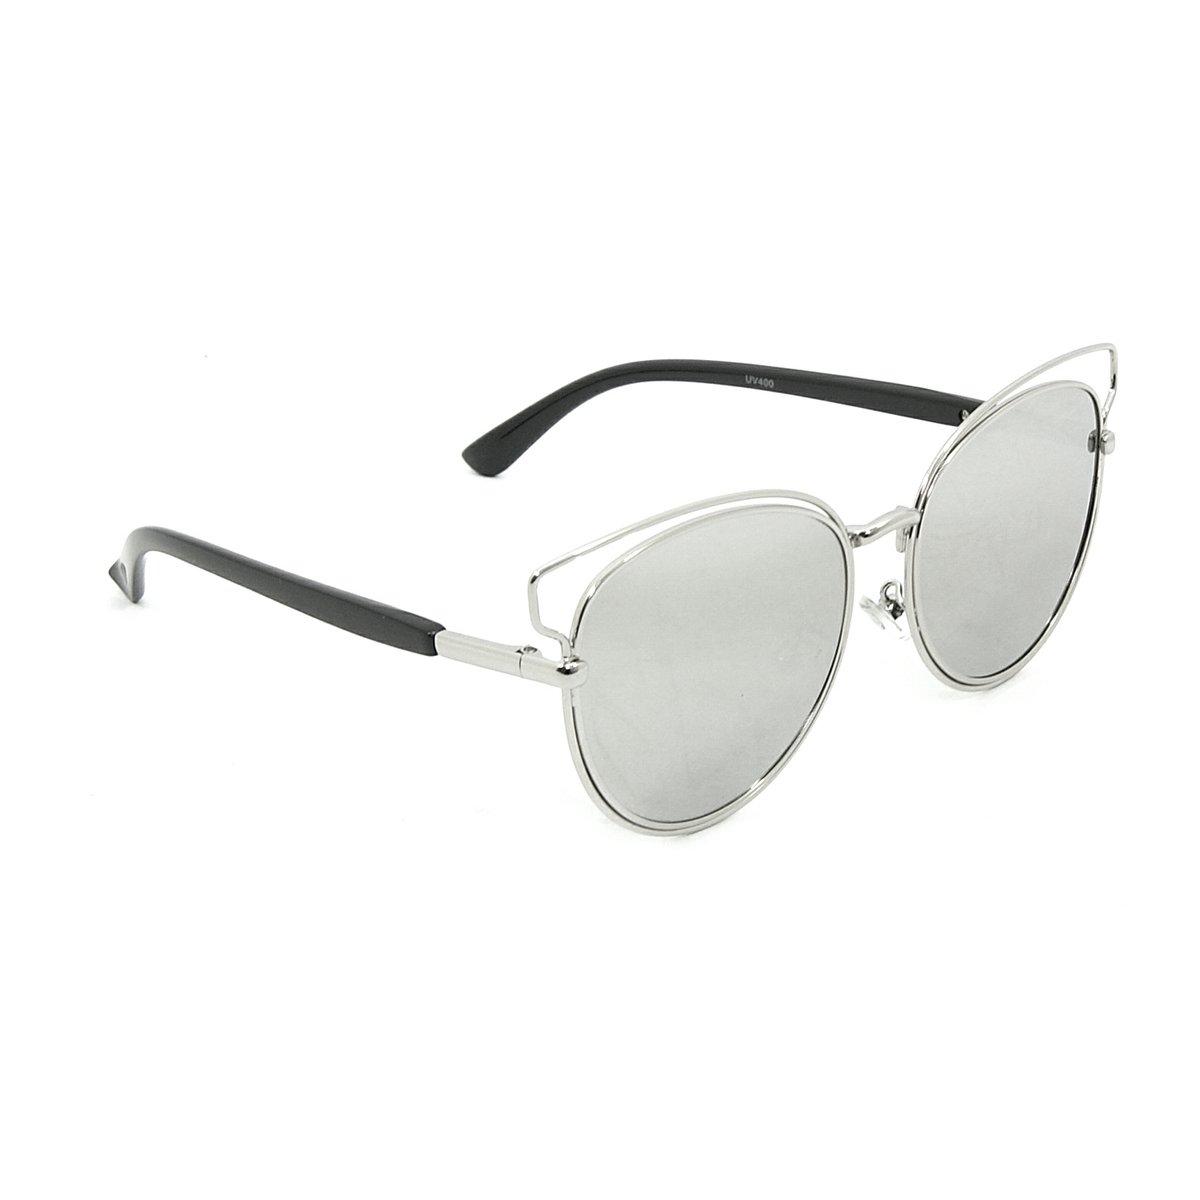 Óculos Bijoulux de Sol Estilo Dior Gatinha Espelhado - Compre Agora ... 0196520b78